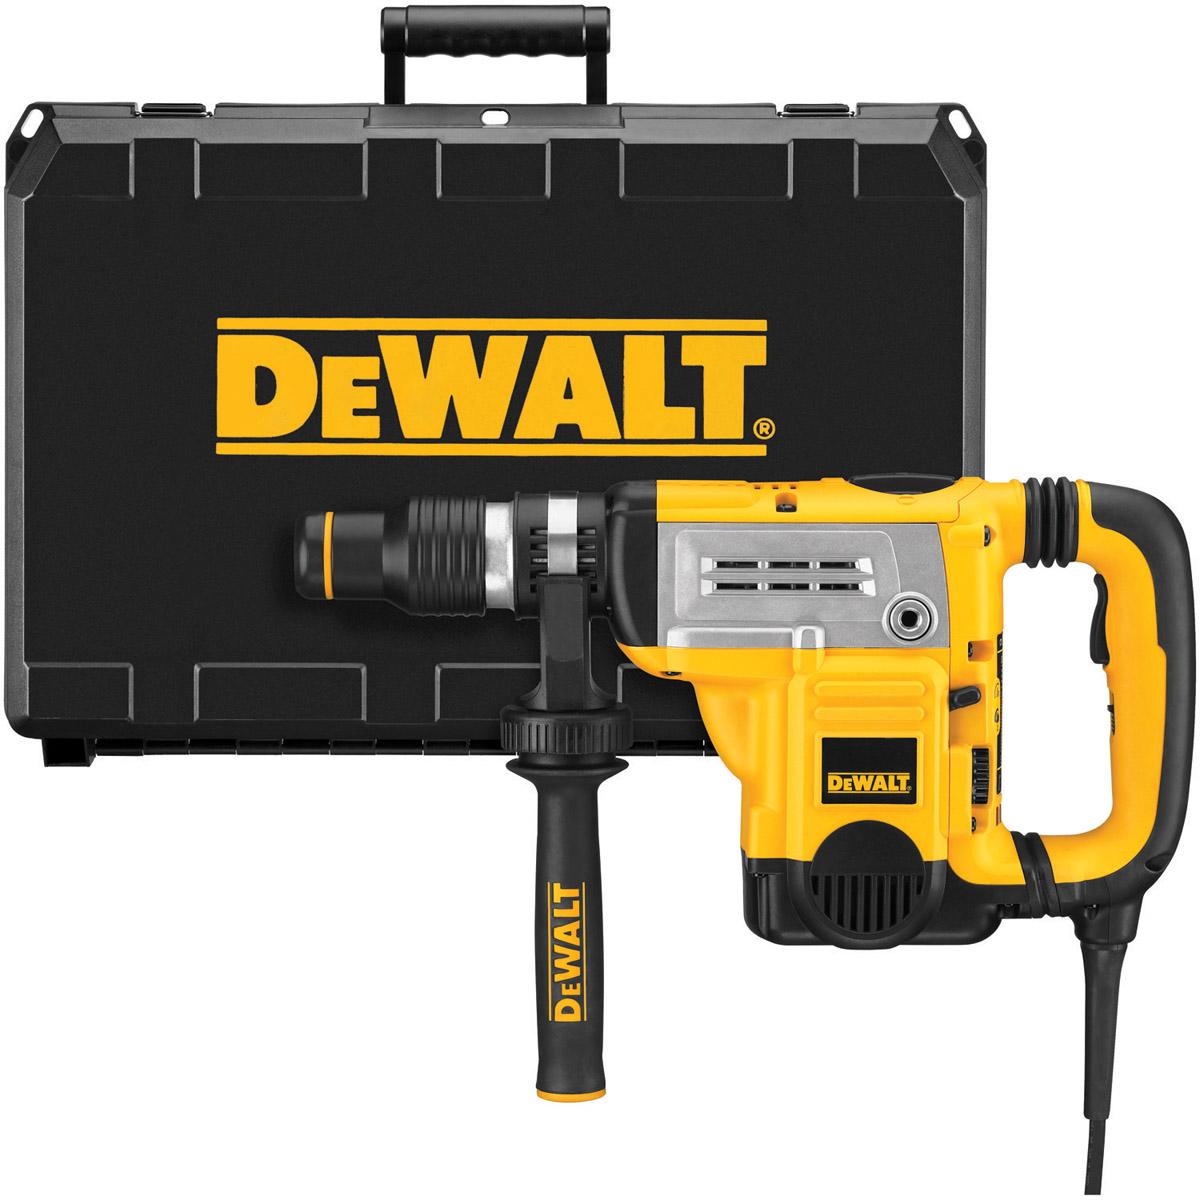 DeWALT D25603K-LX - 6KG SDS Max Comb. Hammer AVC & UTC 45mm 110V